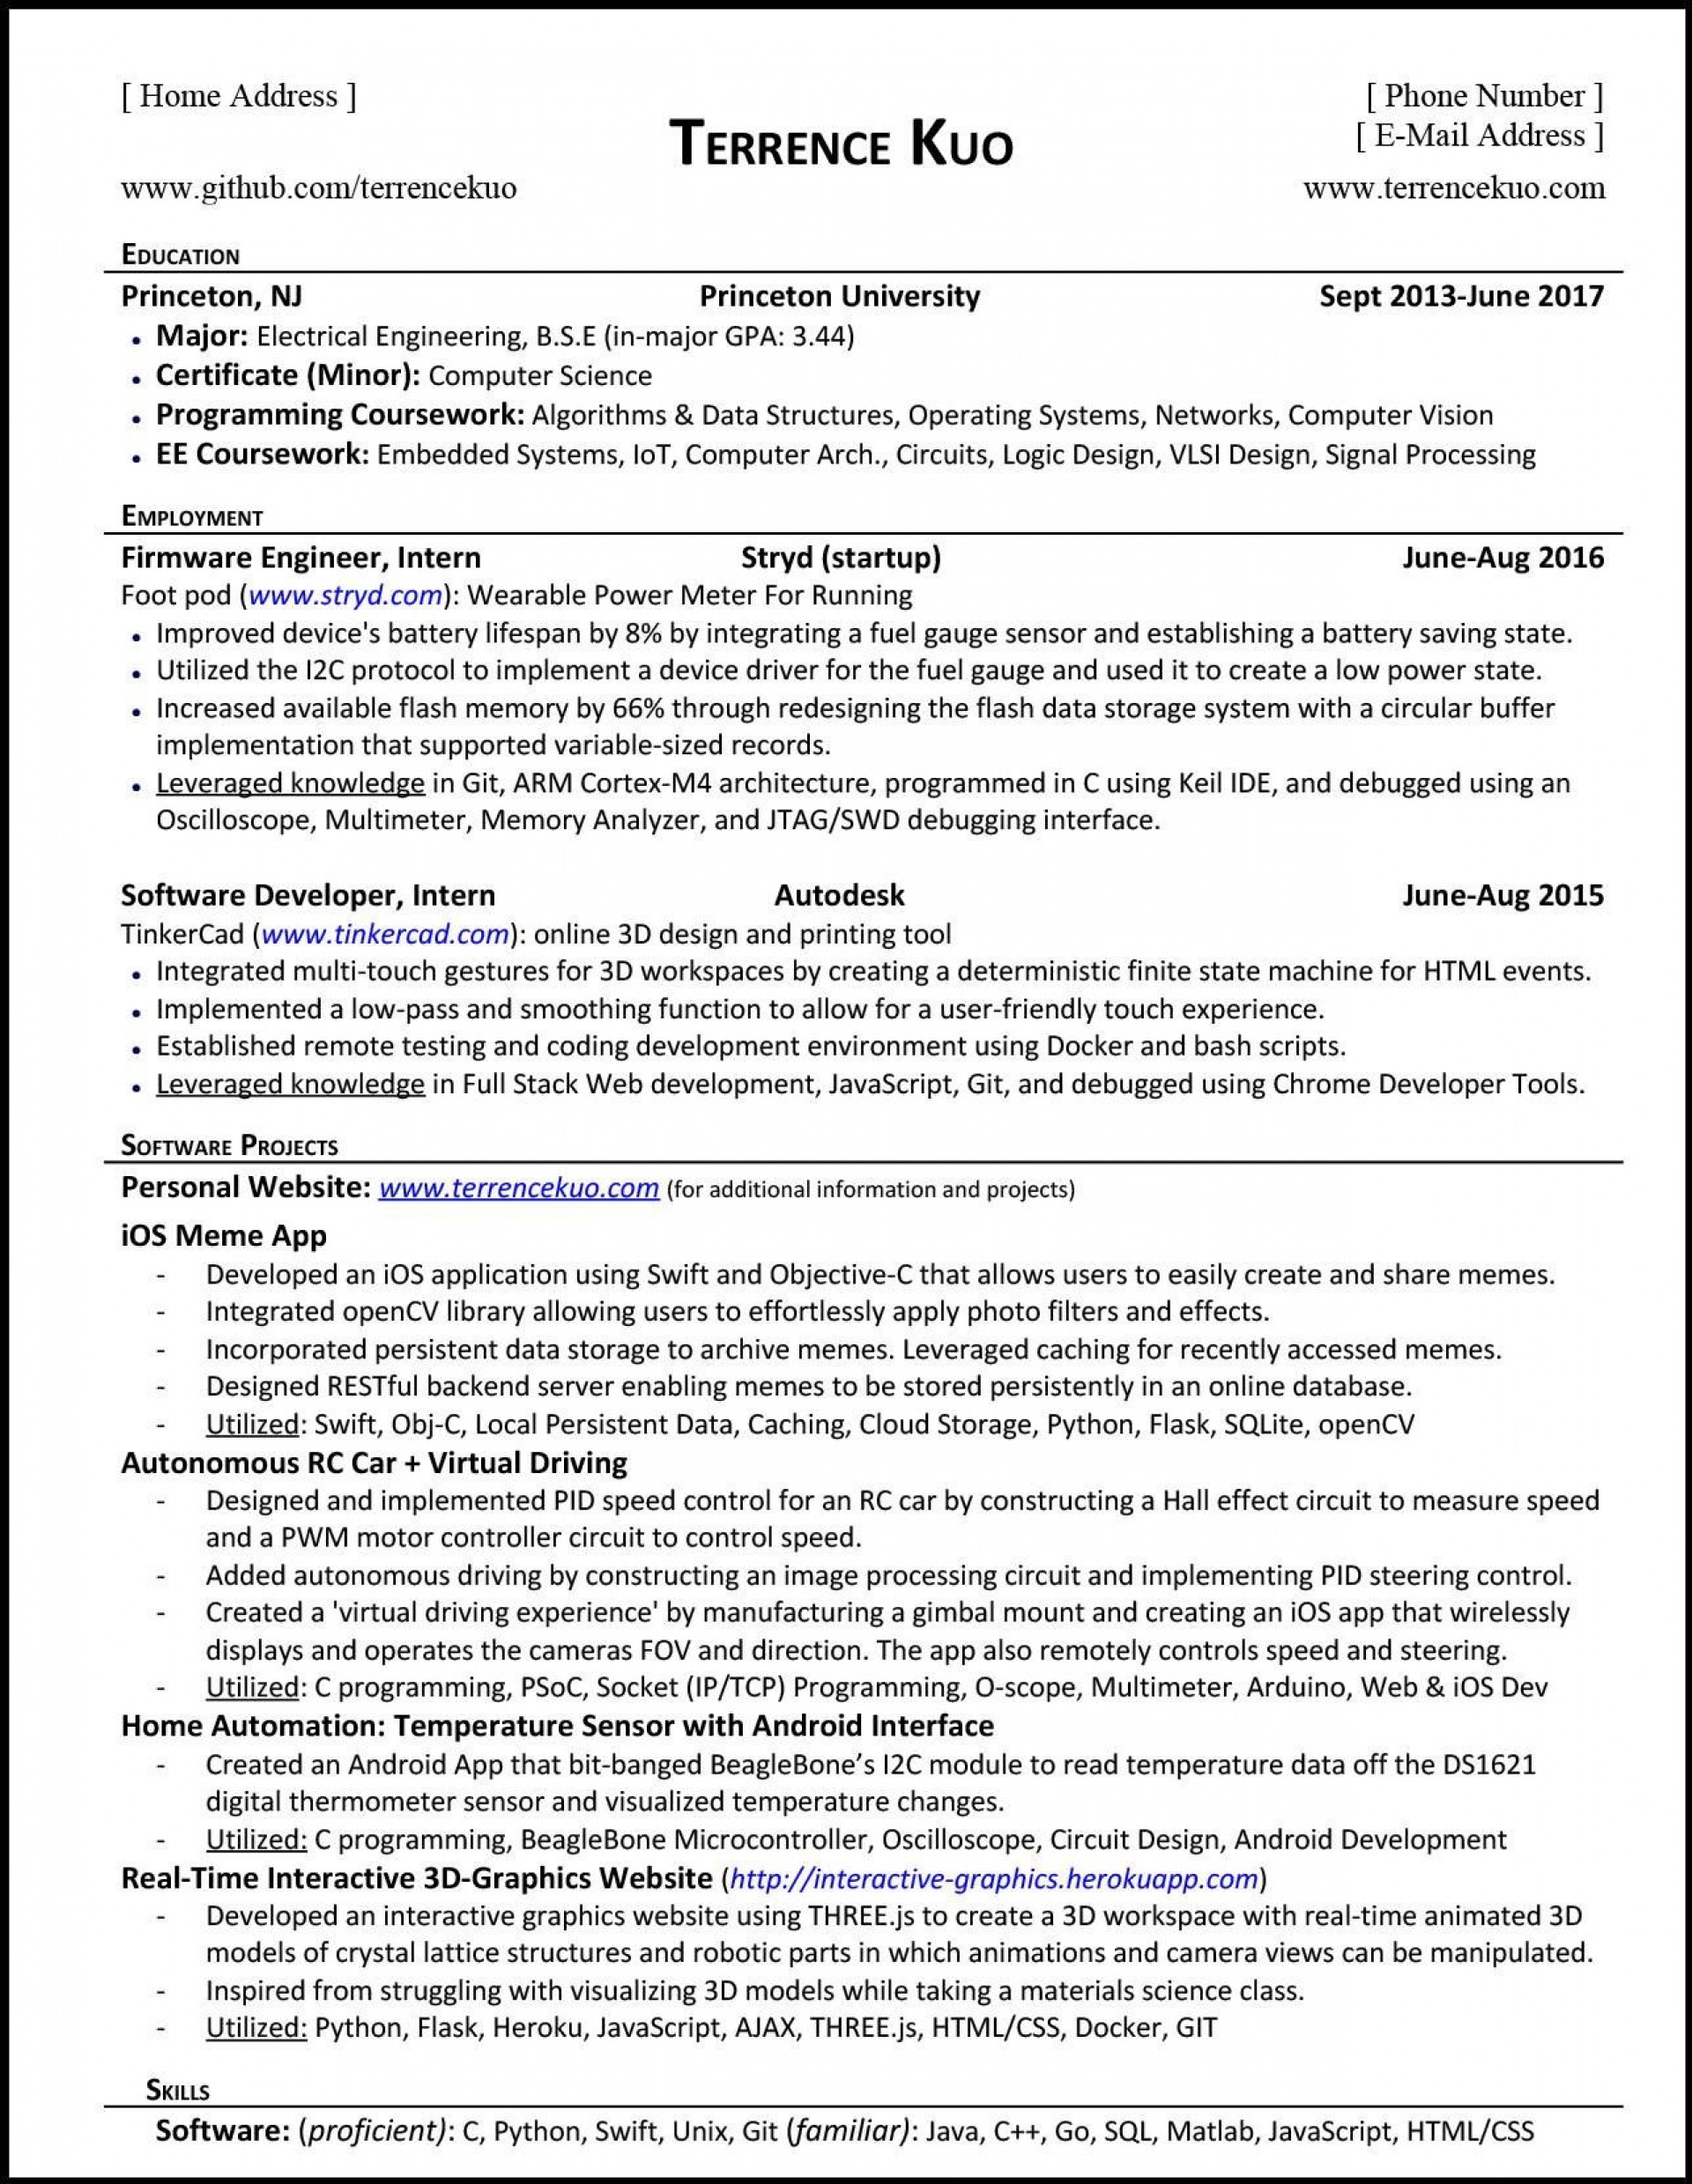 000 Top Software Engineering Resume Template High Resolution  Engineer Microsoft Word Cv Free Developer Download1920